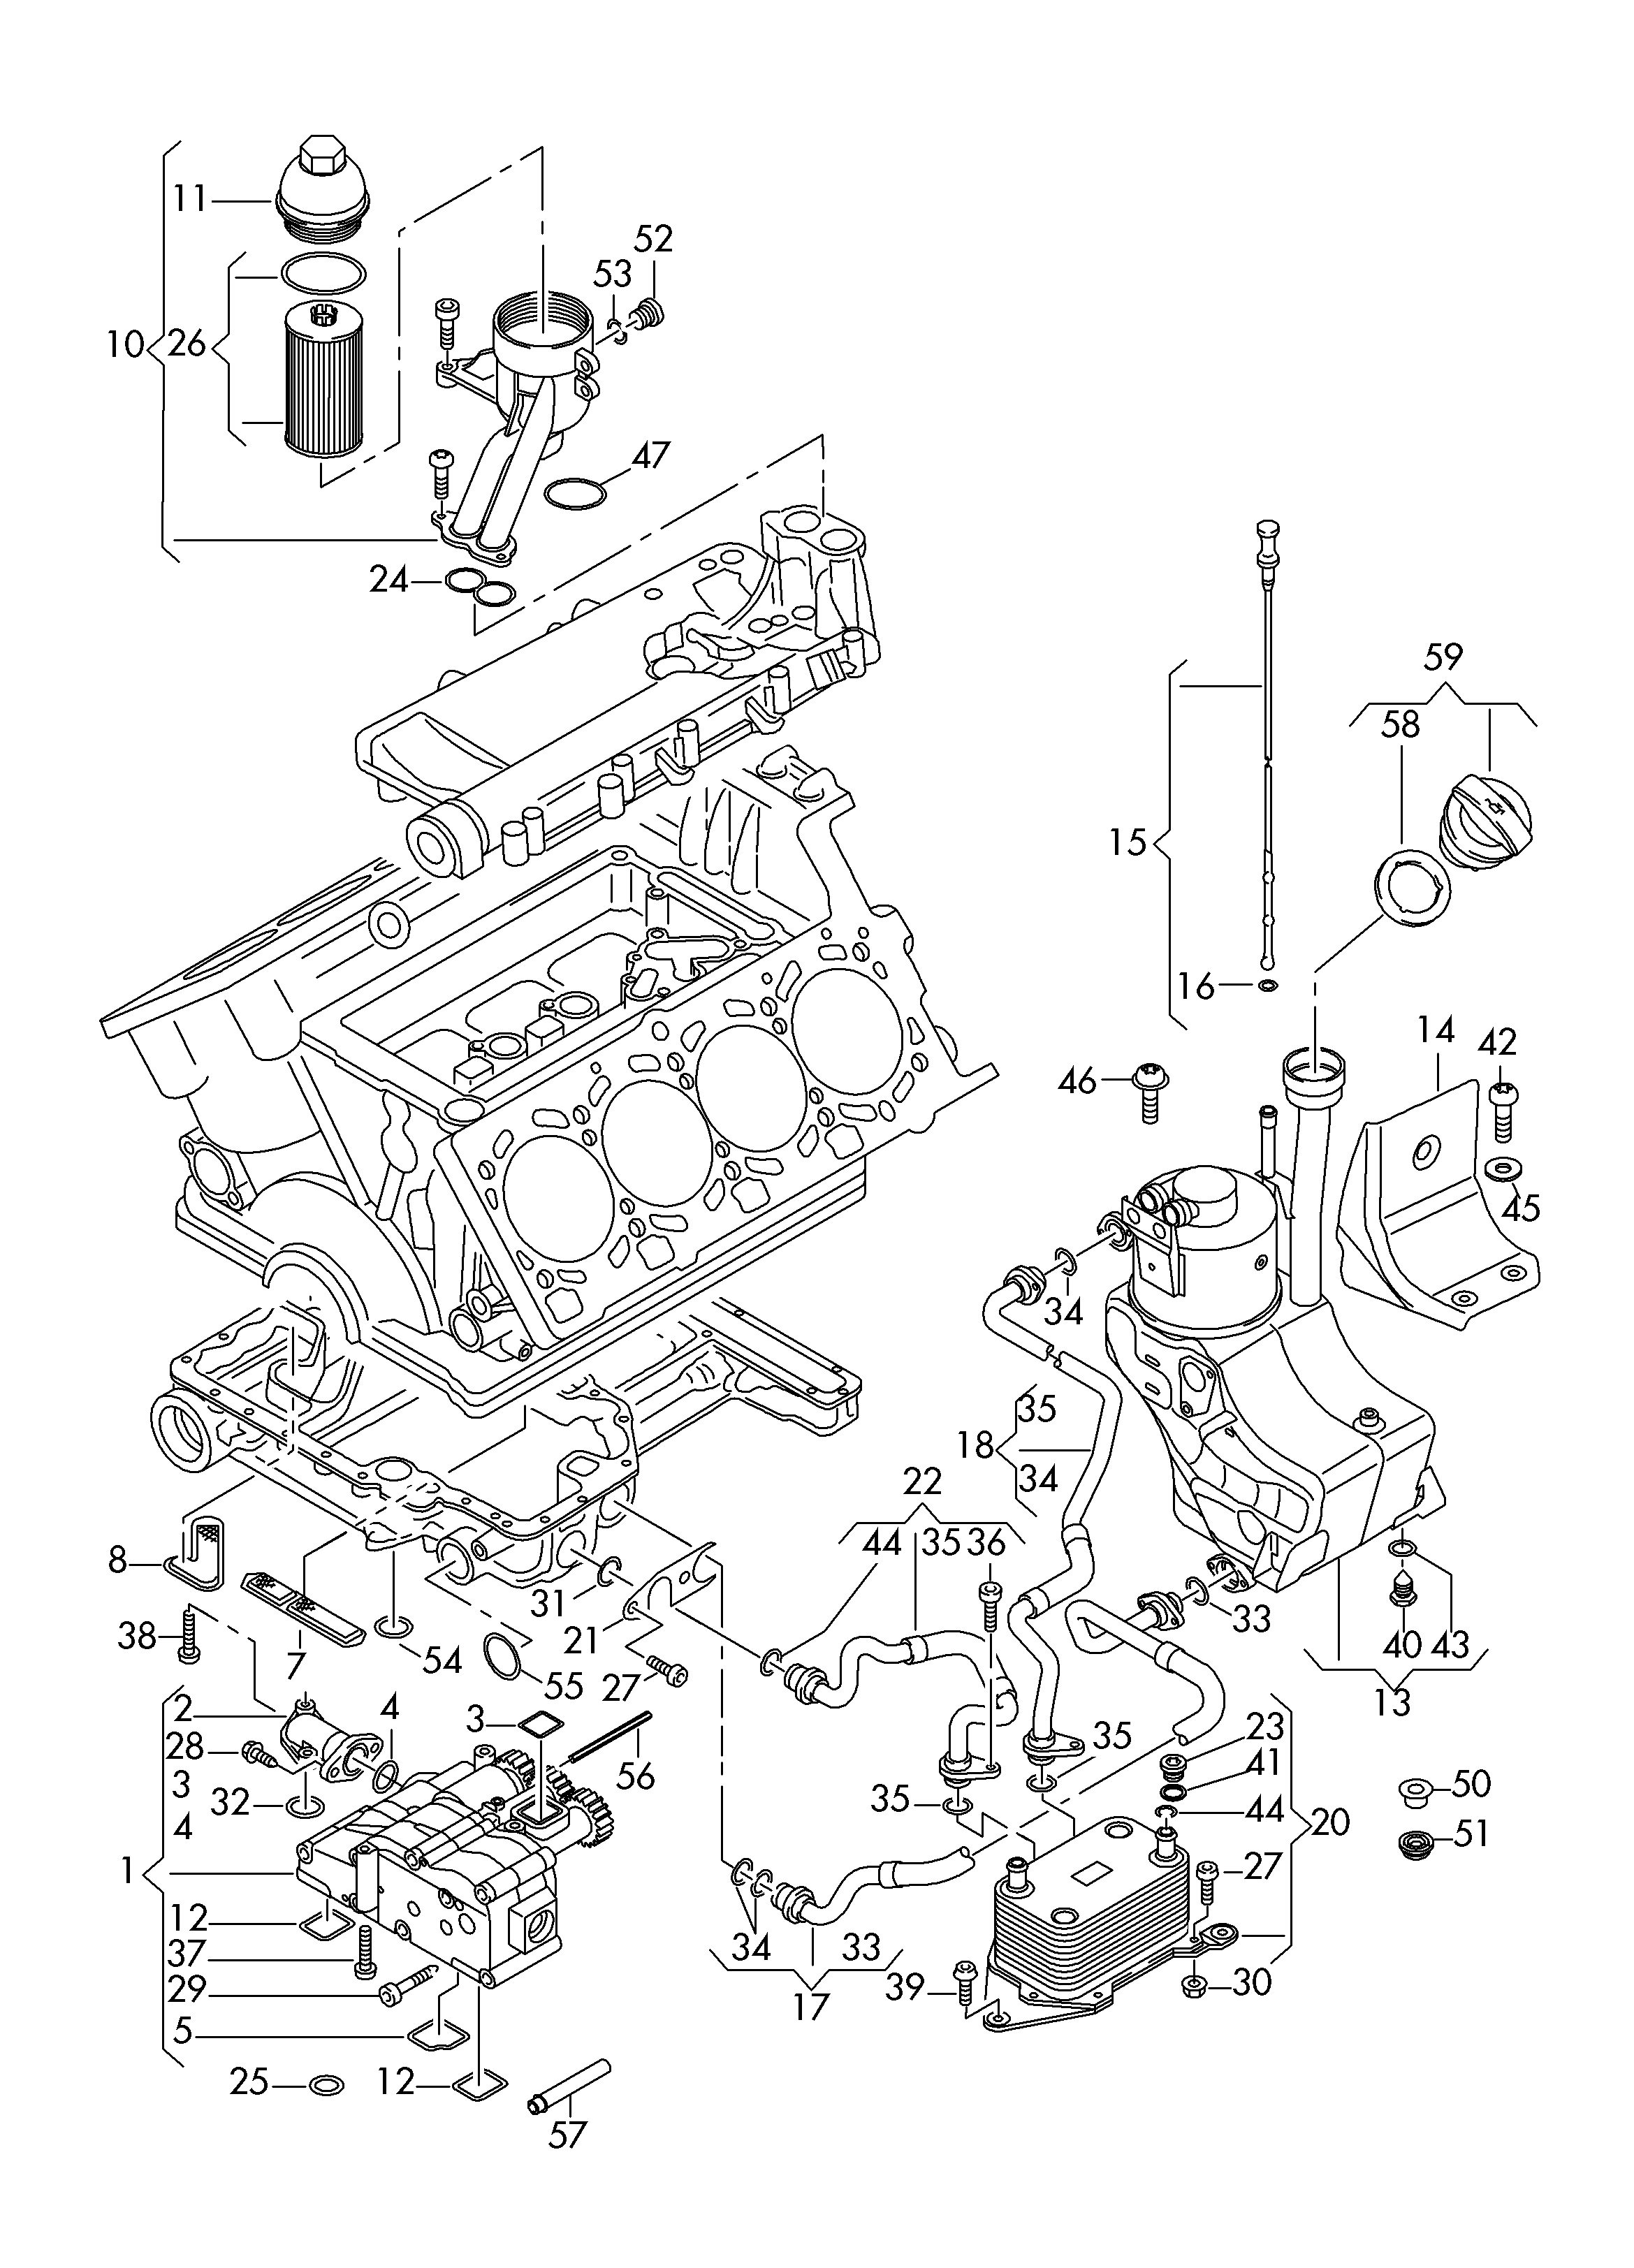 Audi R8 Engine Diagram - wiring diagram diode-total -  diode-total.hoteloctavia.it   Audi R8 Engine Diagram      hoteloctavia.it